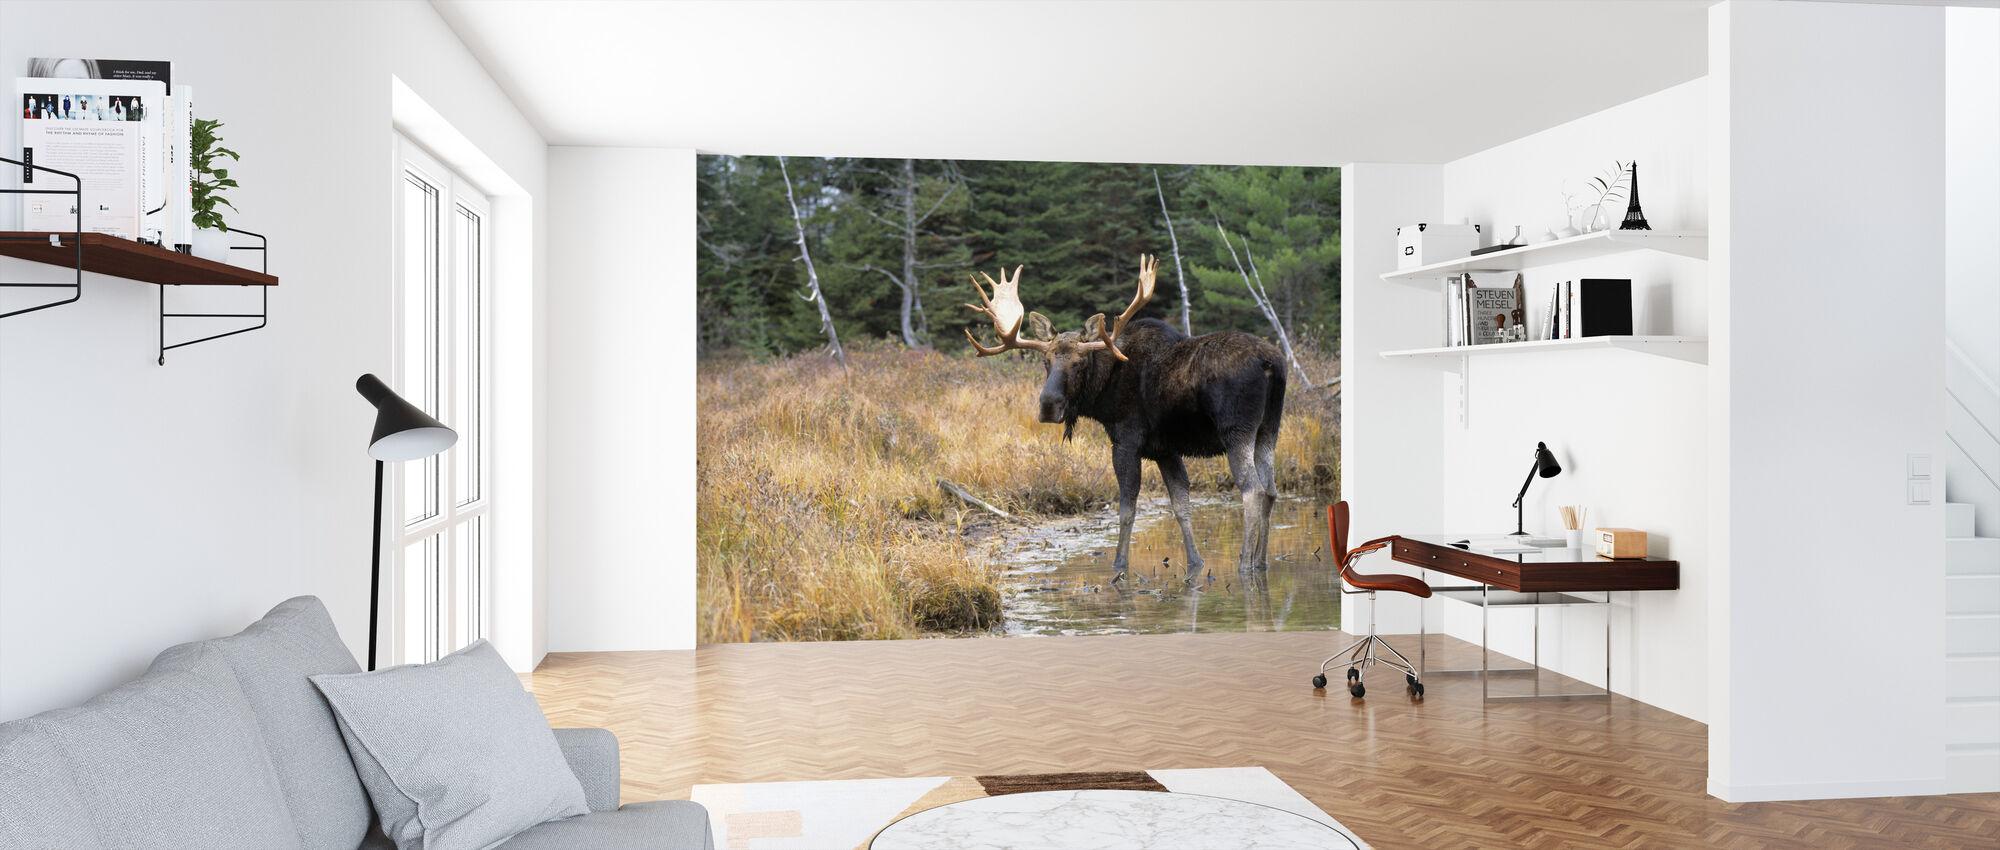 Moose in Woods - Wallpaper - Office